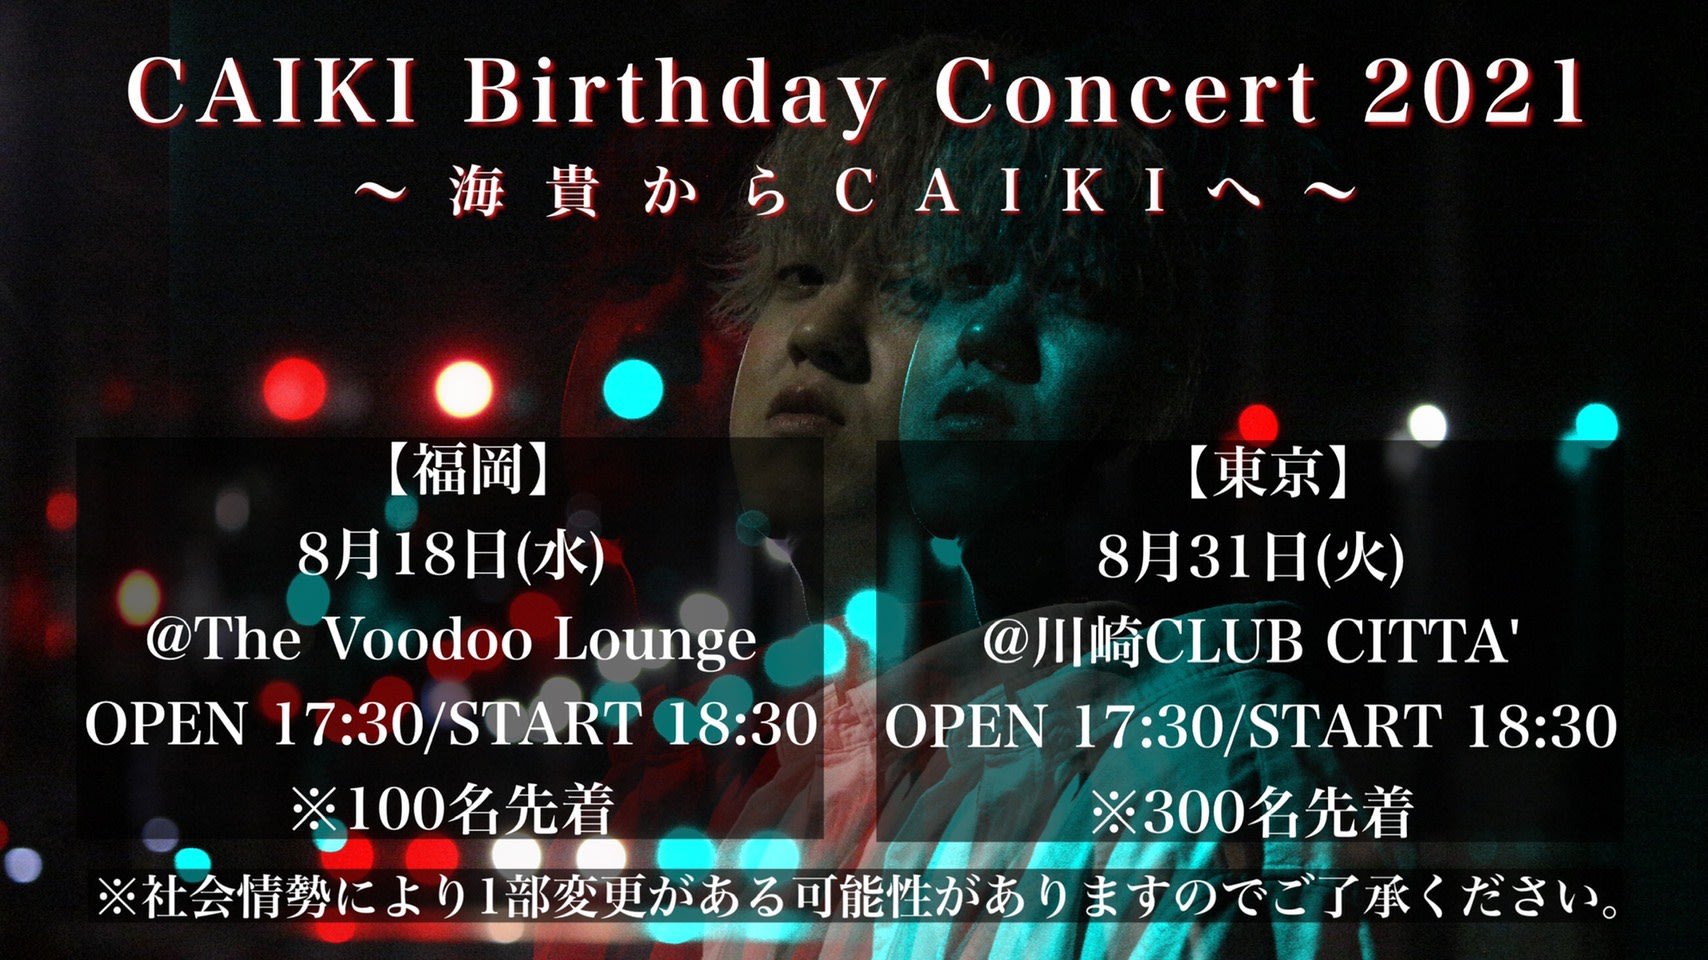 CAIKI Birthday Concert 2021東京公演S席特別チケットの画像